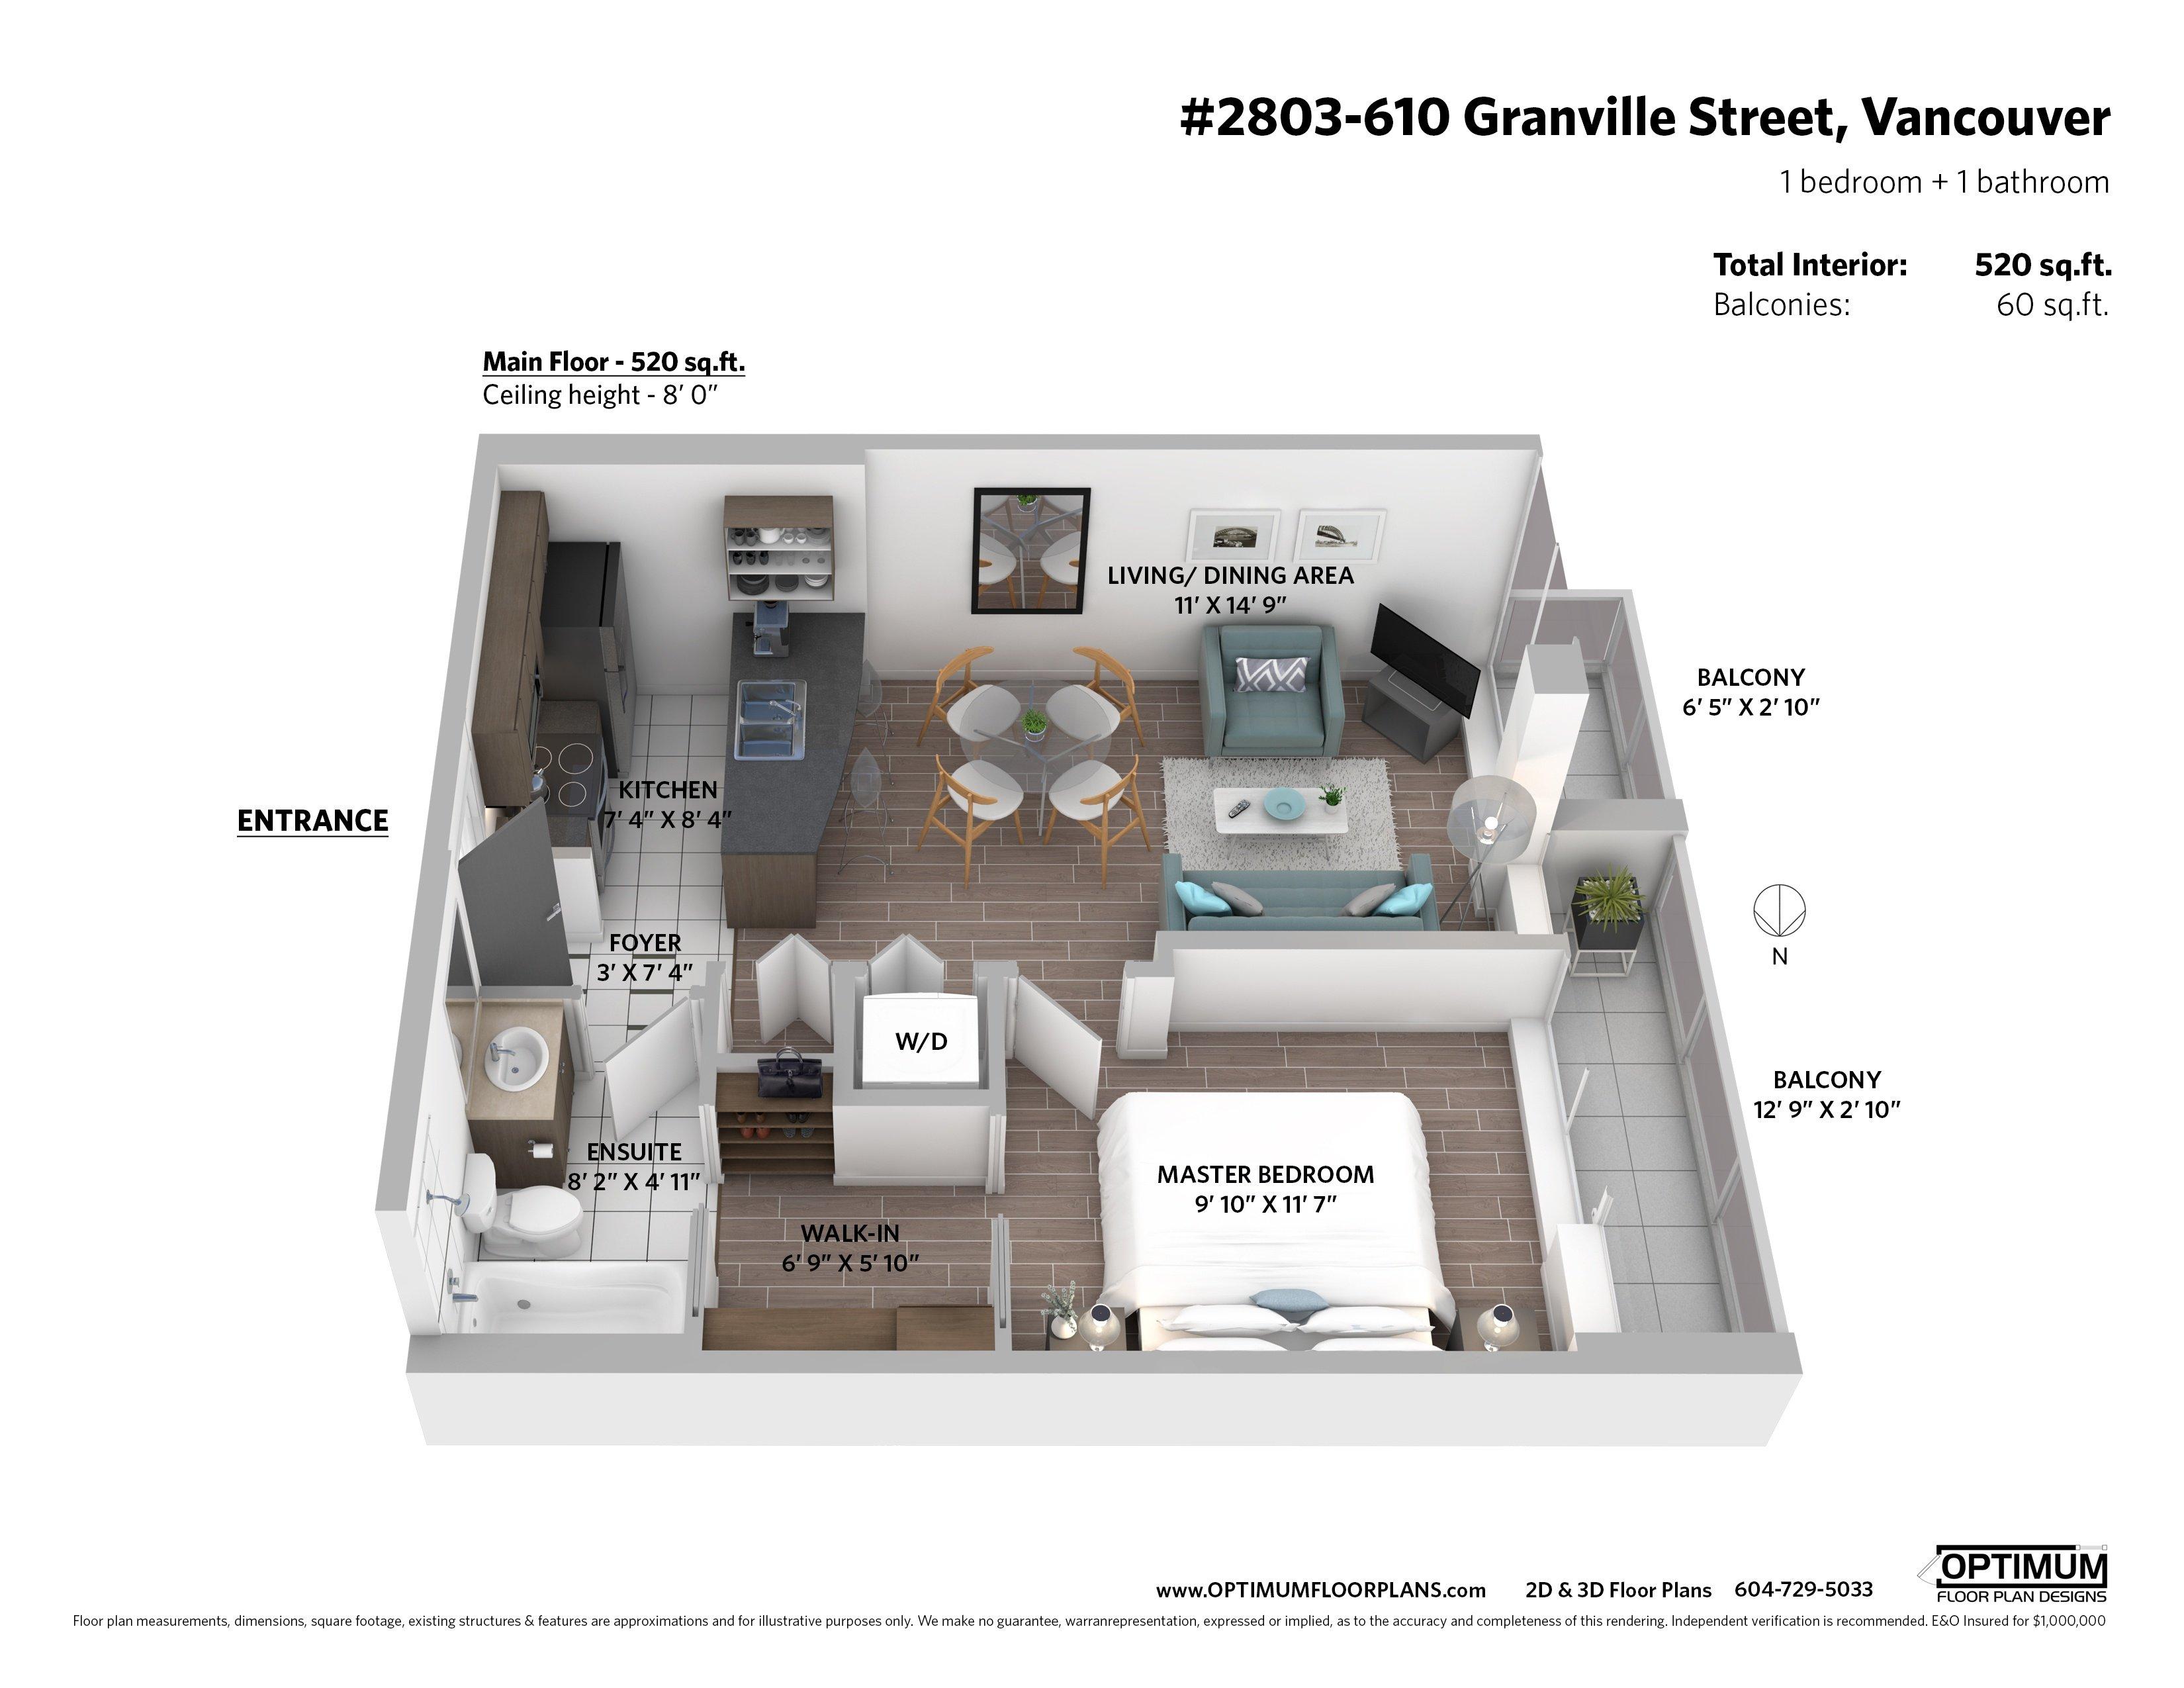 The Hudson Live Work Condos 610 Granville St 610 Granville Street Vancouver Albrighton Real Estate Vancouver Lofts Modern Architectural Homes